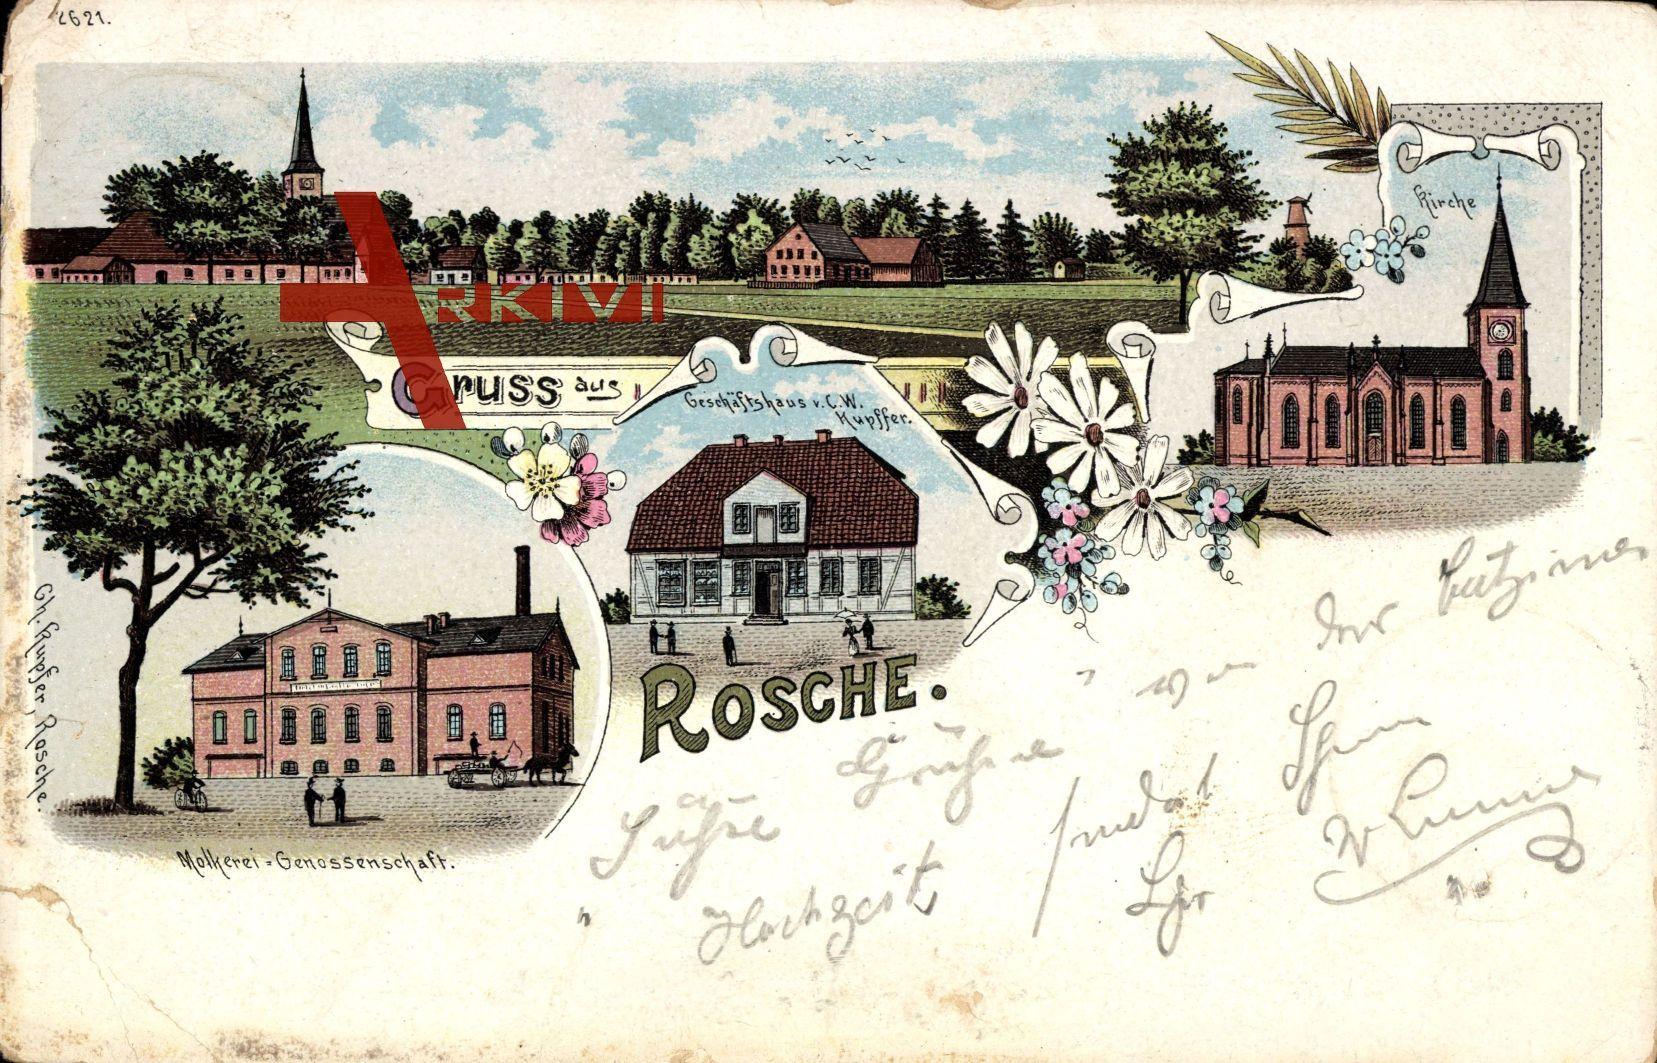 Rosche Kreis Uelzen, Molkerei Genossenschaft, Geschäft C.W. Kupffer